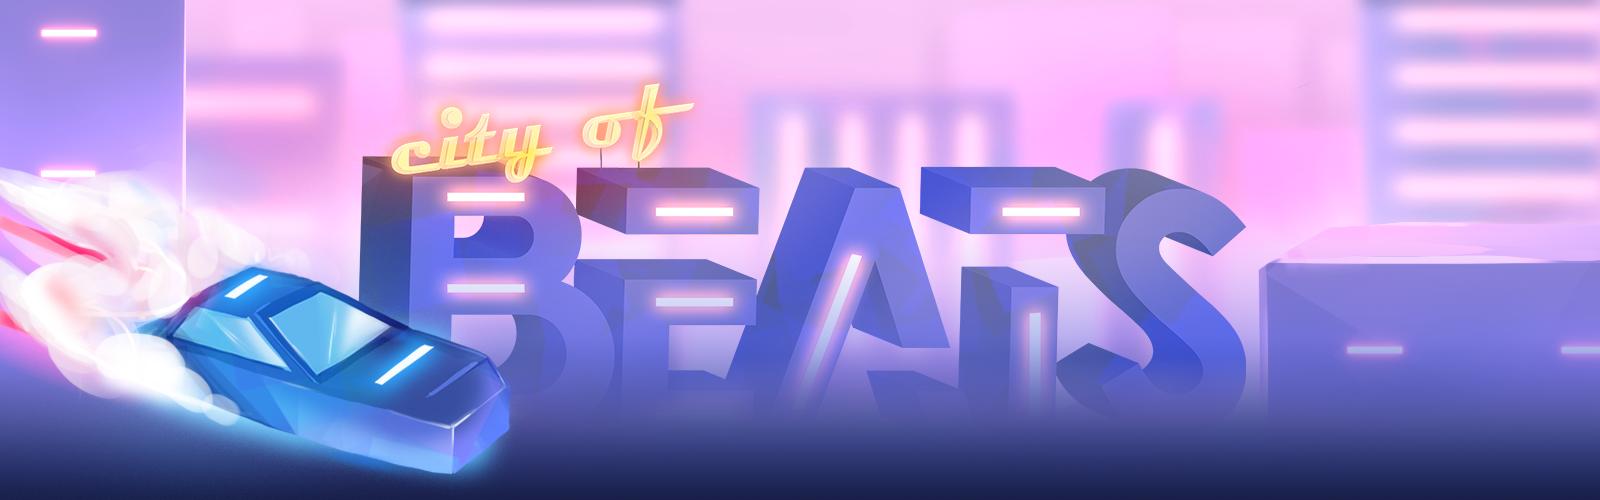 City of Beats